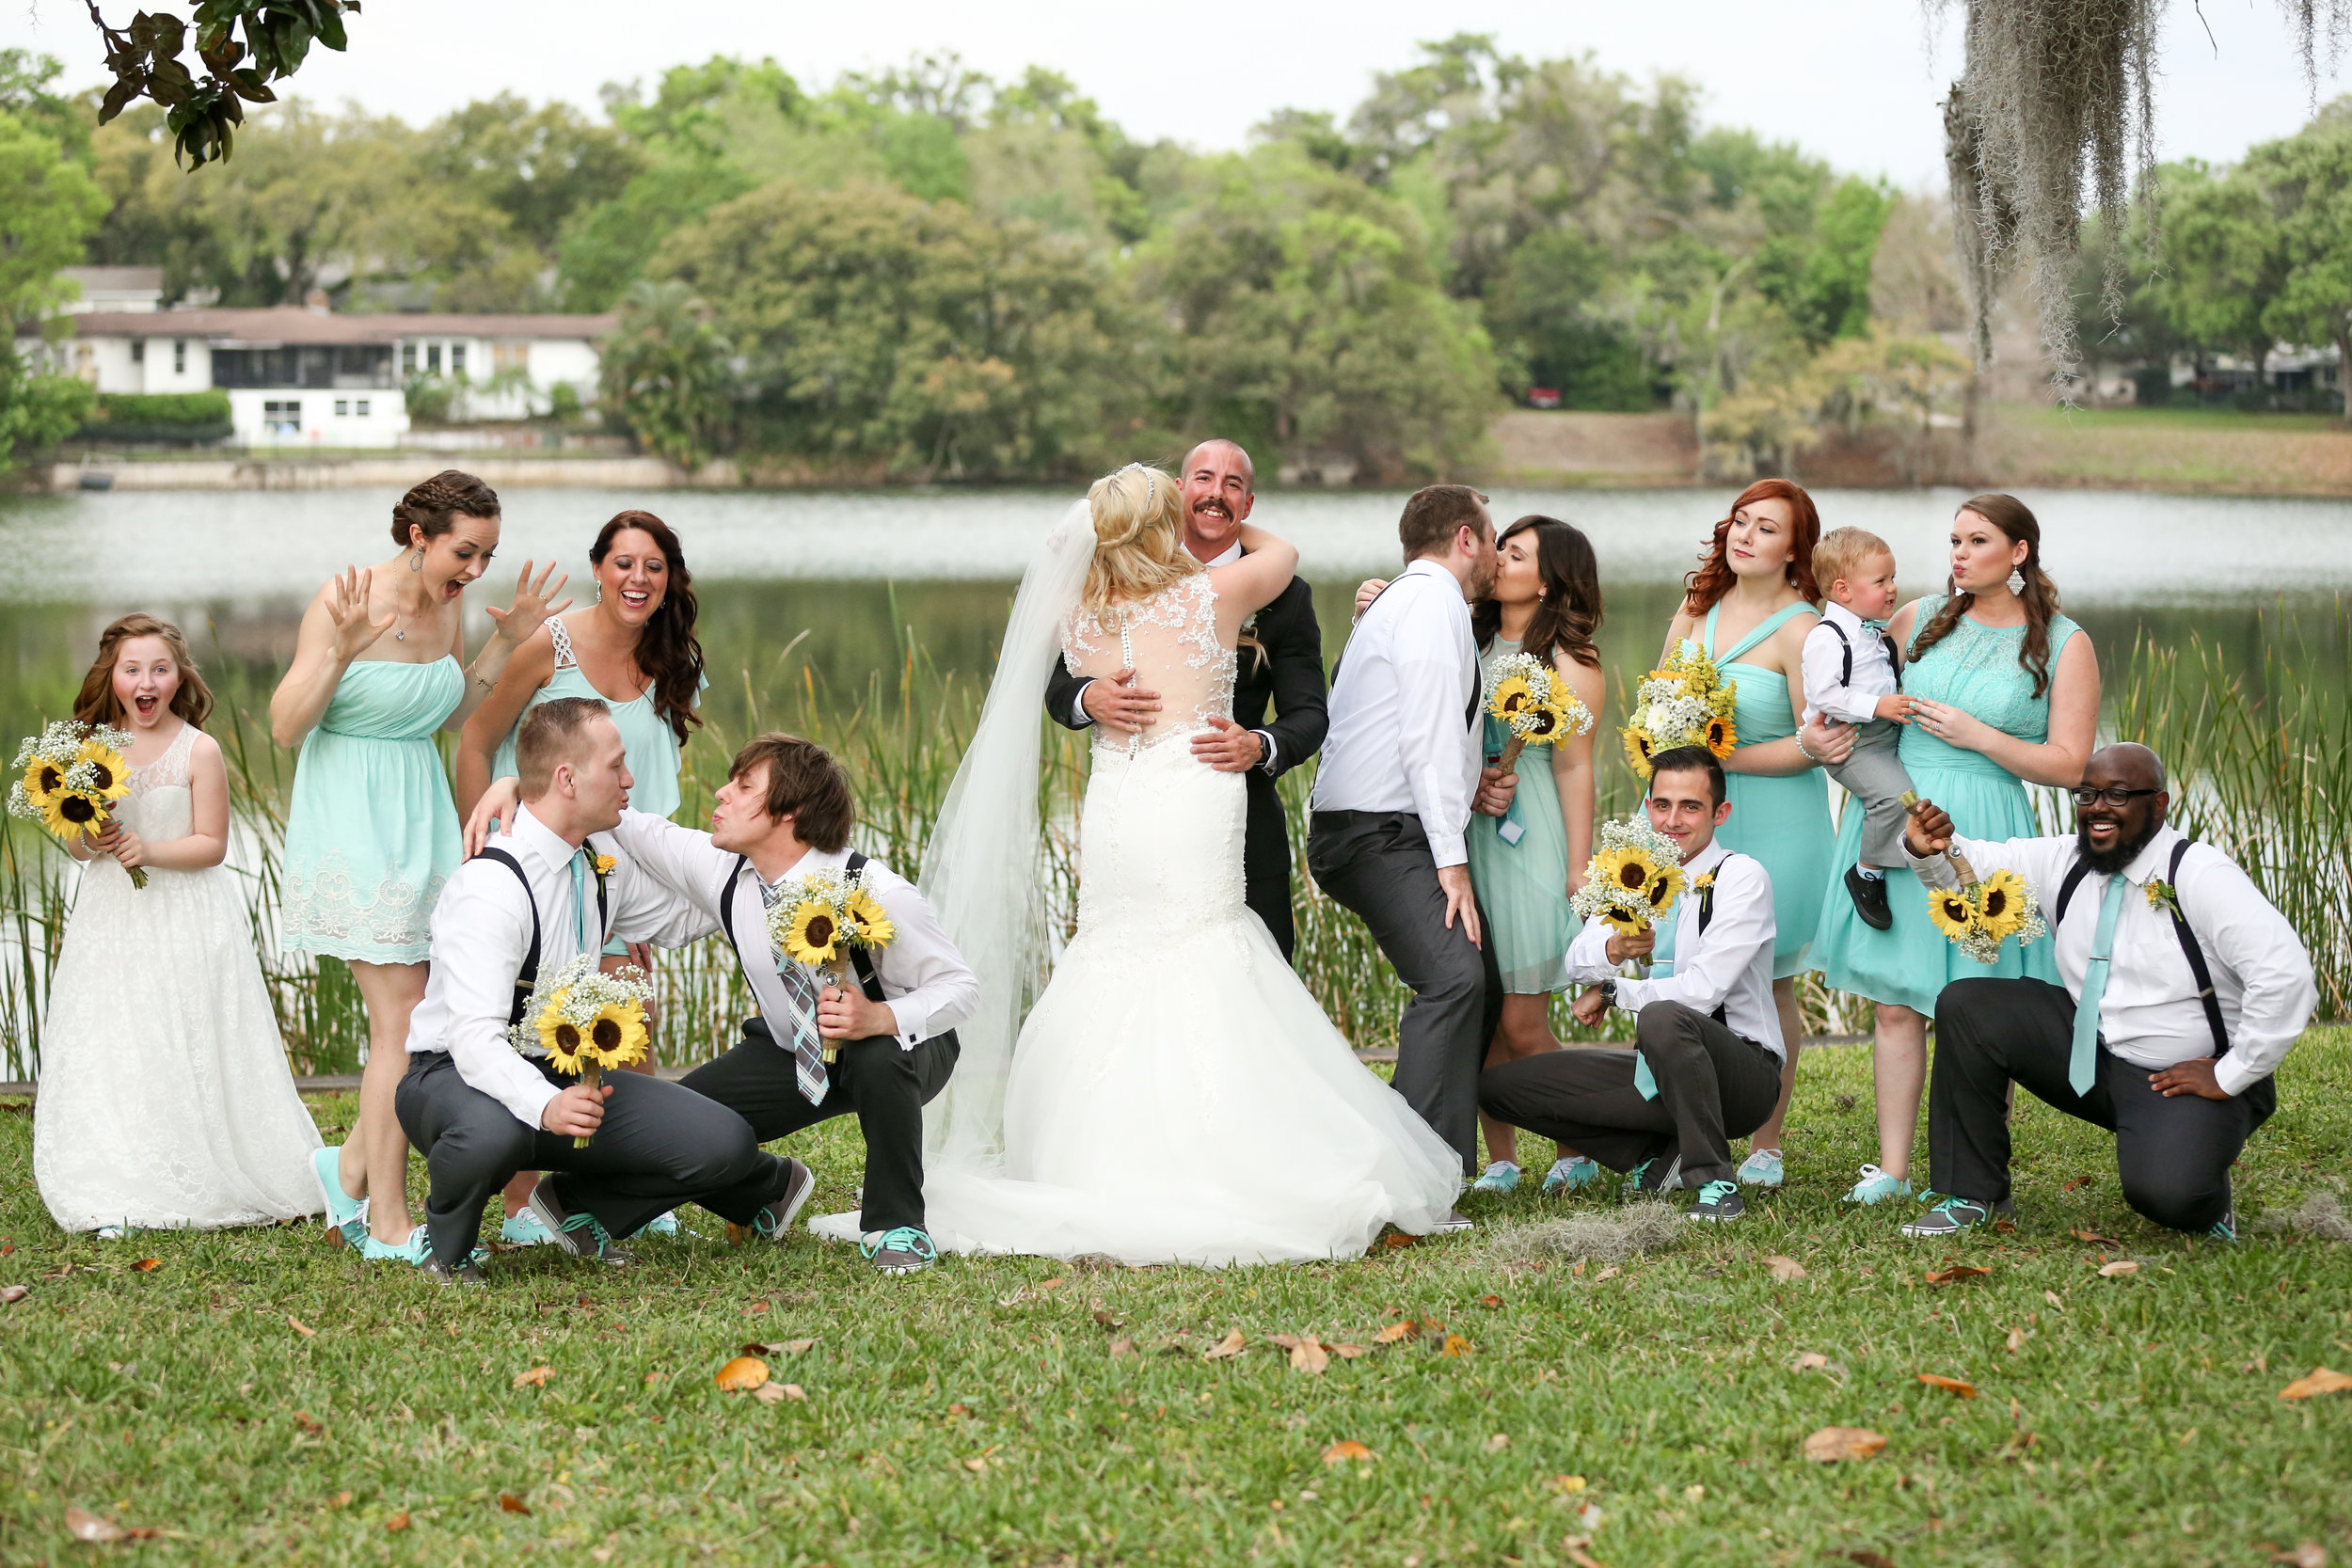 orlando-wedding-photographer-live-happy-studio-fun-portrait-bridal-party.jpg